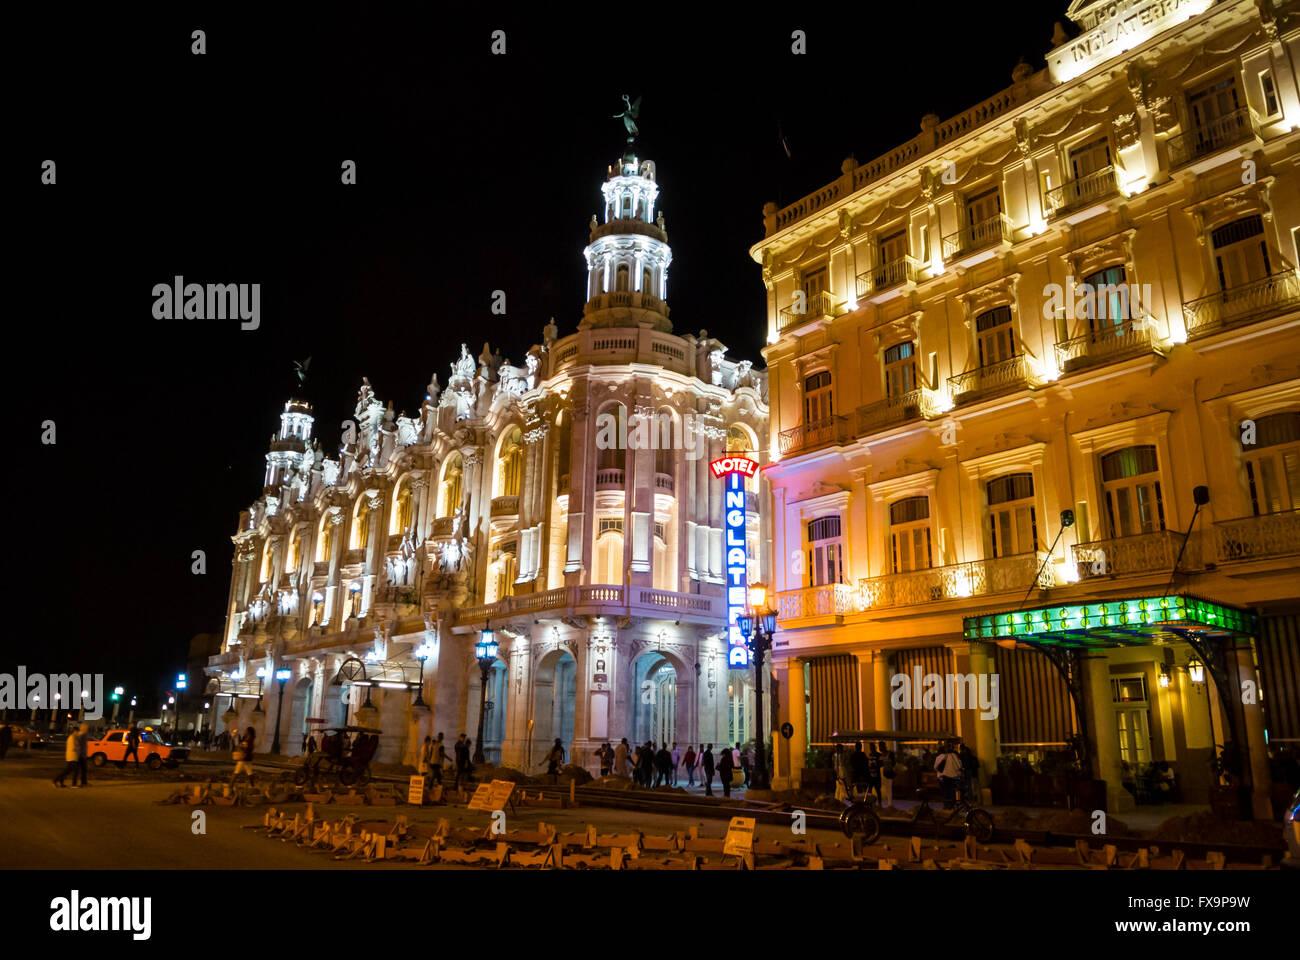 Gran Teatro de La Habana and Hotel Inglaterra Havana Cuba - Stock Image